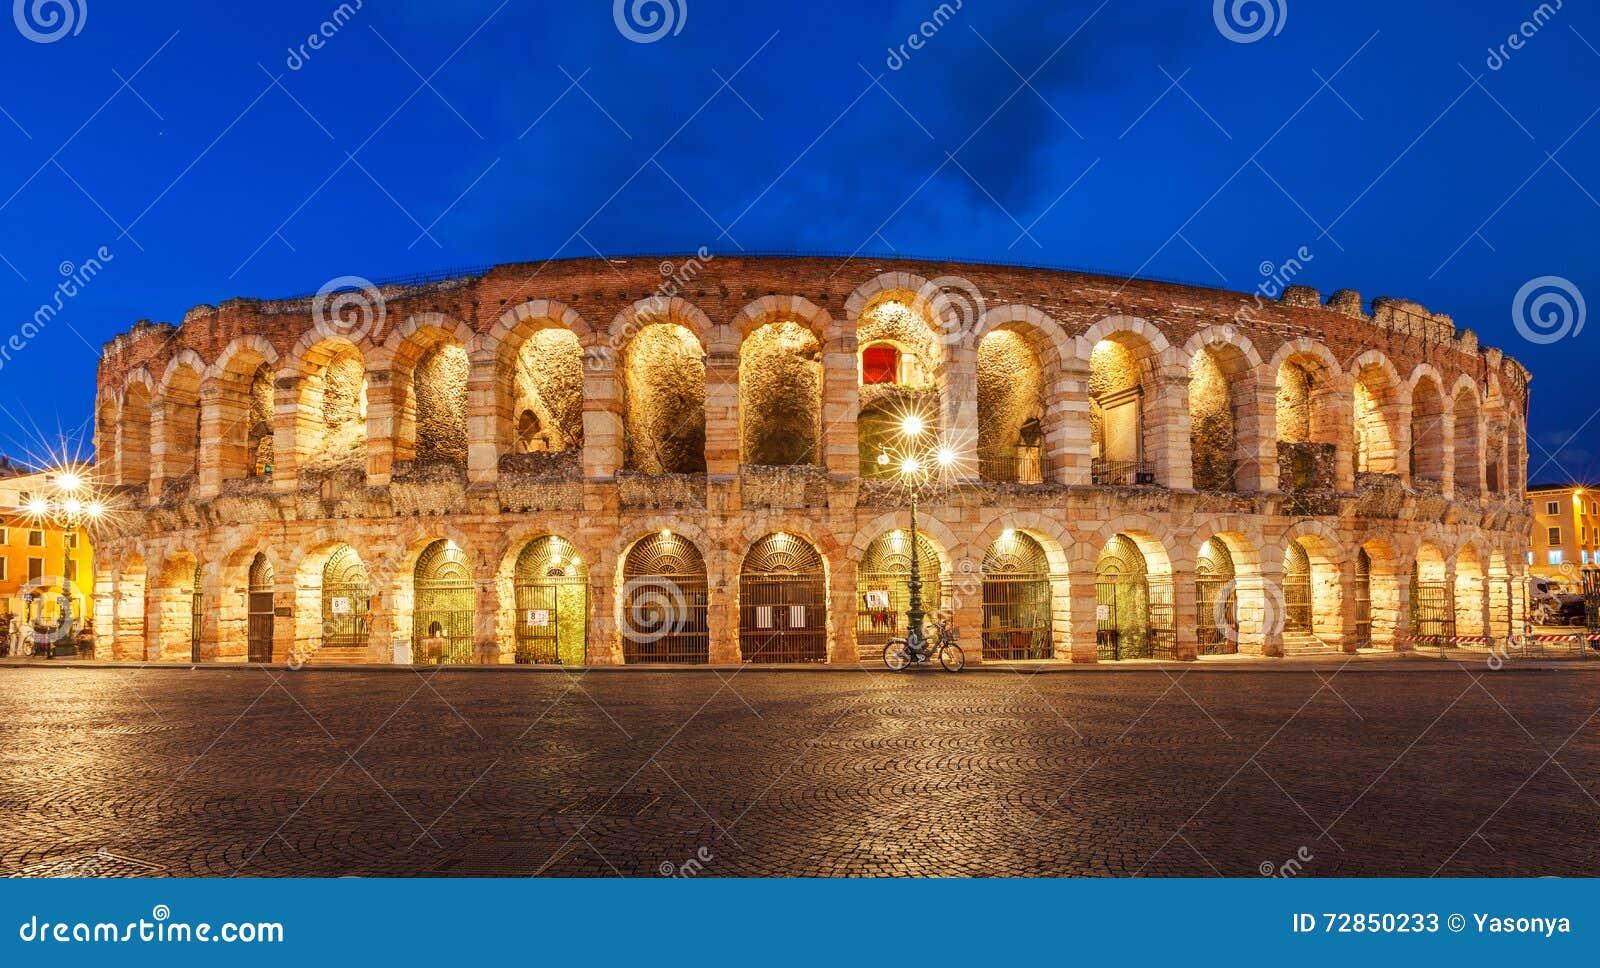 Arena Di Verona Theatre In Italy Stock Image - Image of ...